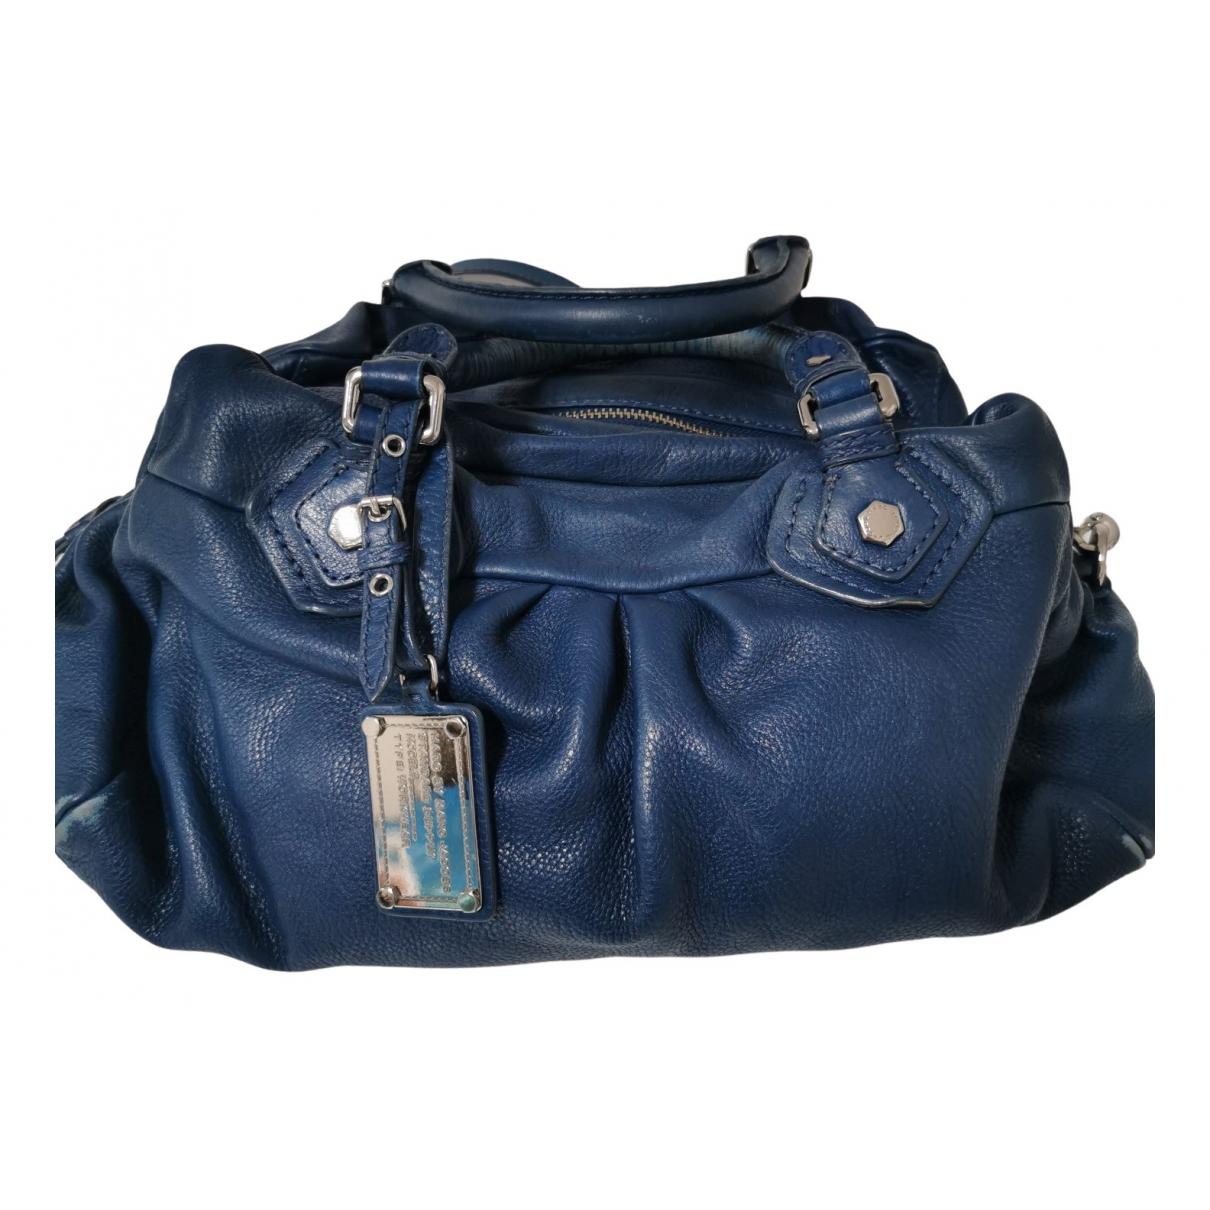 Marc By Marc Jacobs N Blue Cloth handbag for Women N